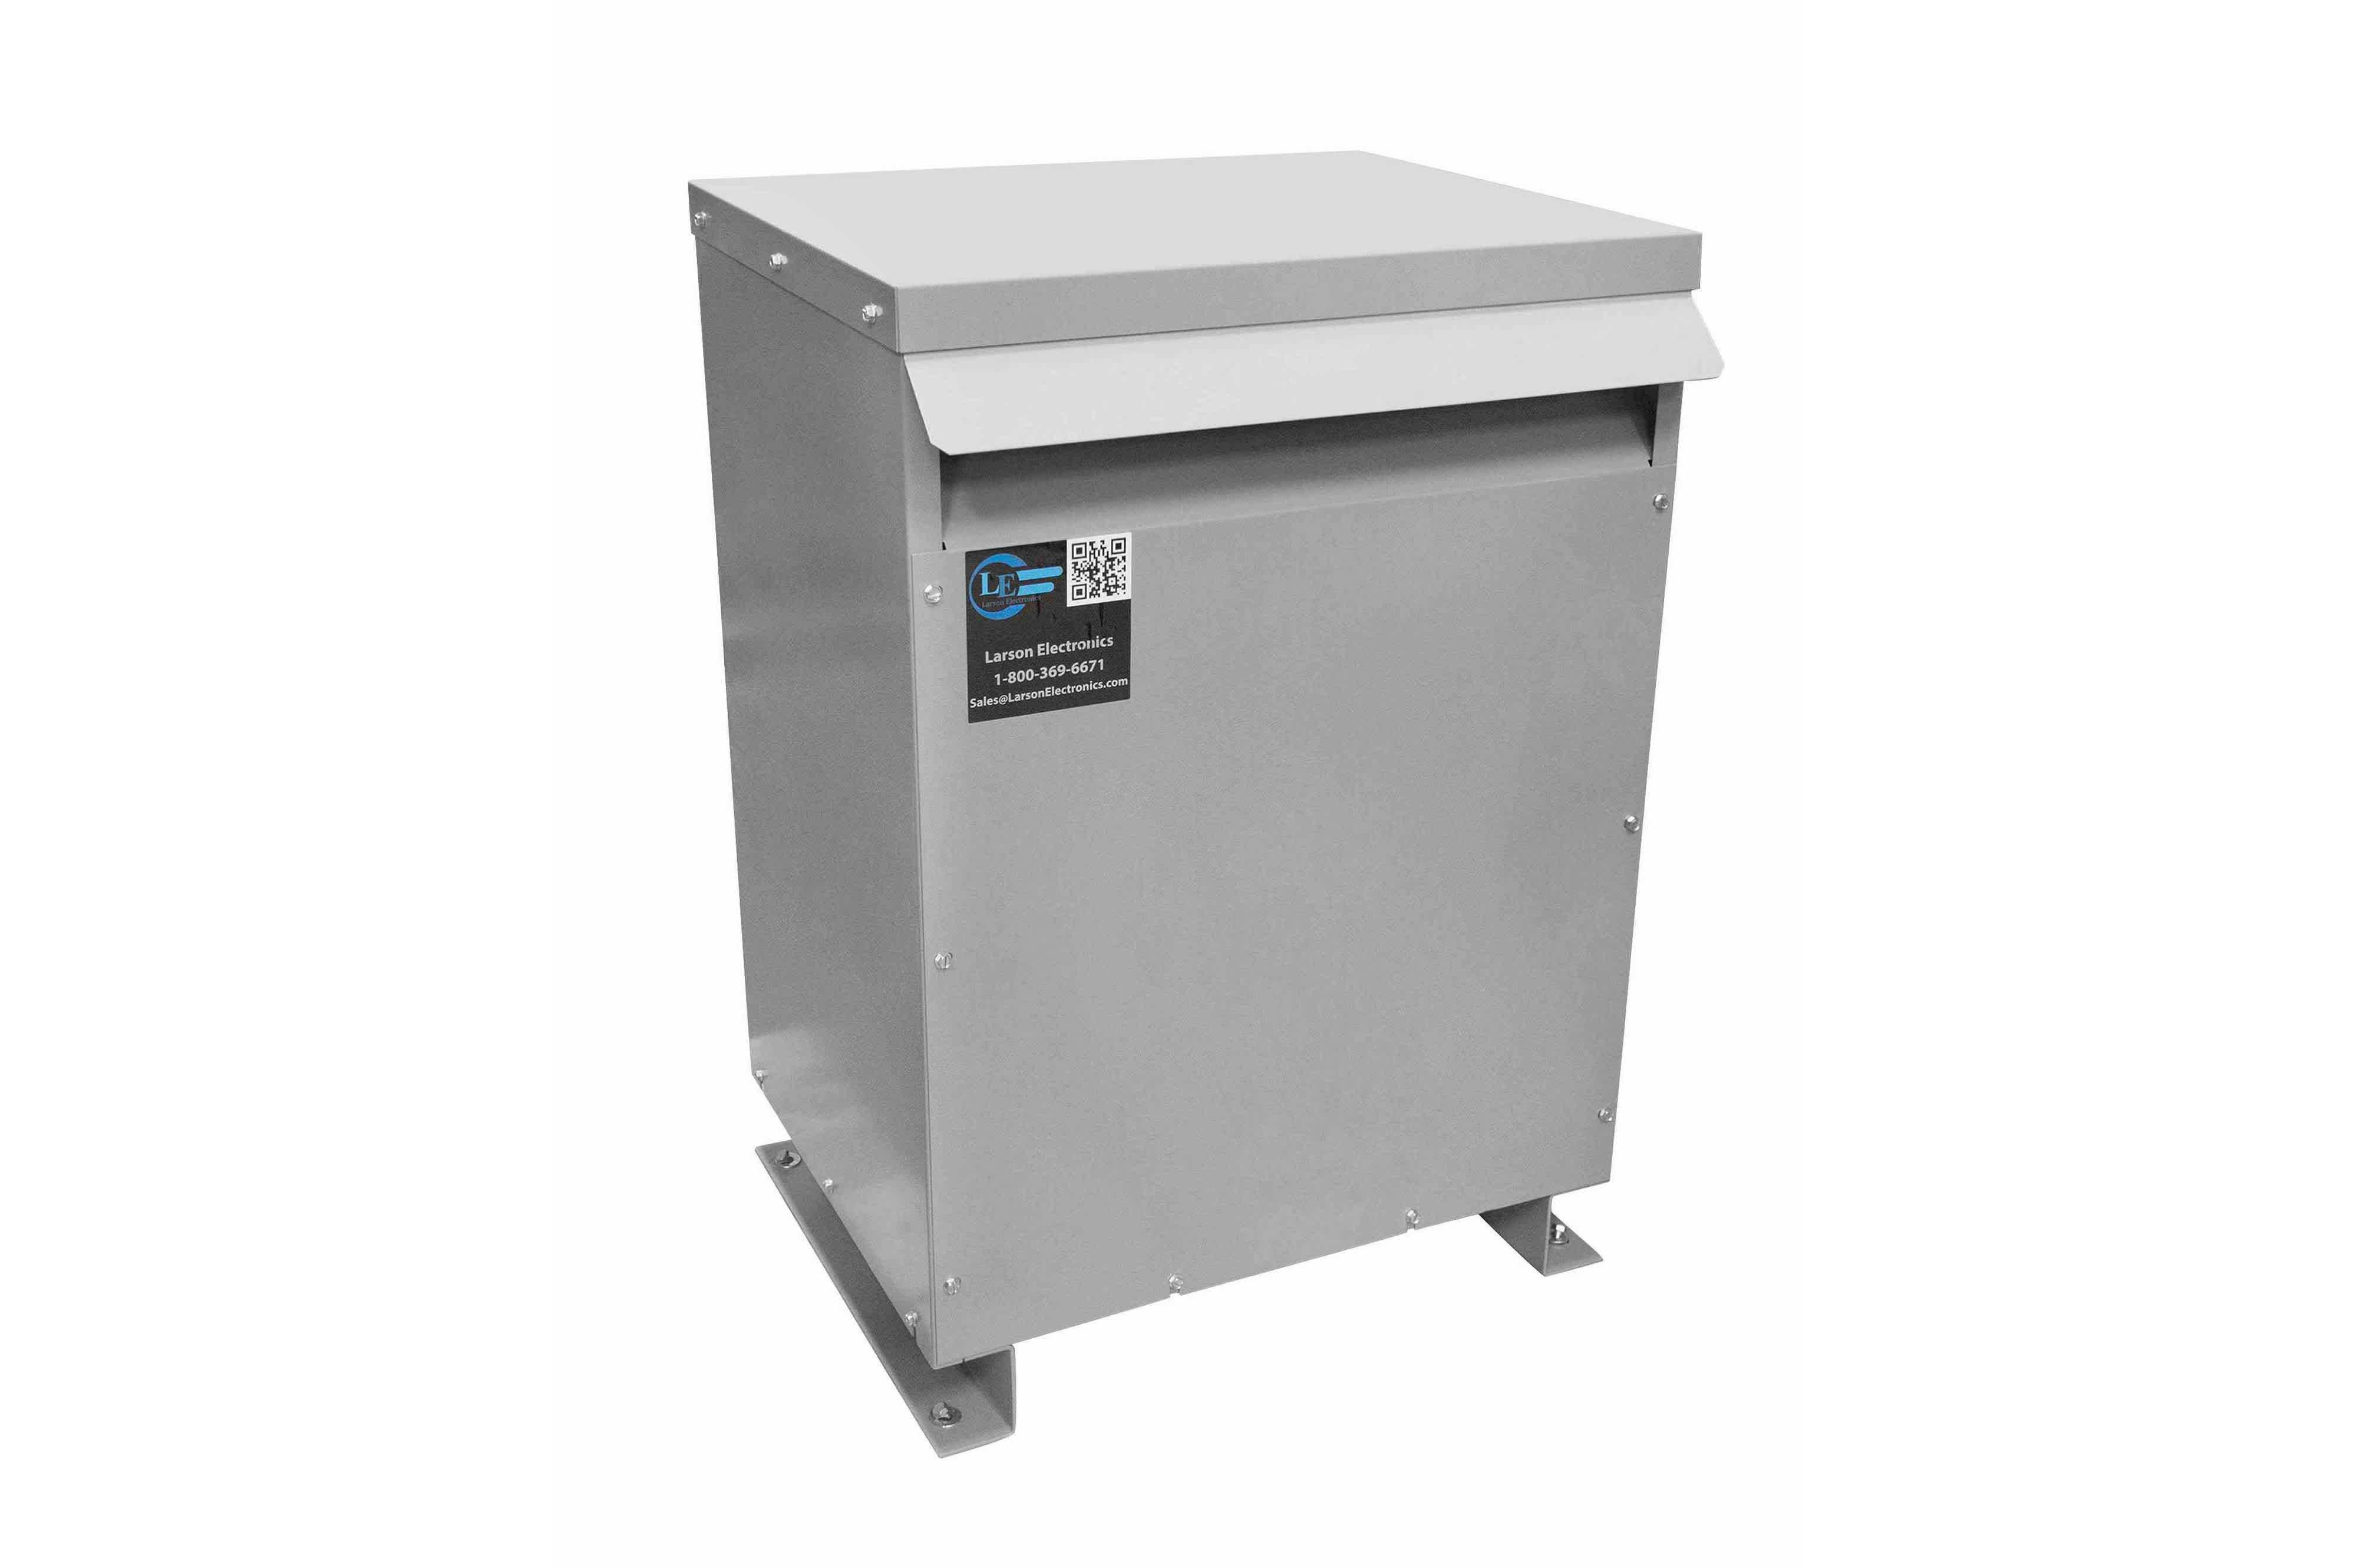 900 kVA 3PH Isolation Transformer, 575V Wye Primary, 415V Delta Secondary, N3R, Ventilated, 60 Hz